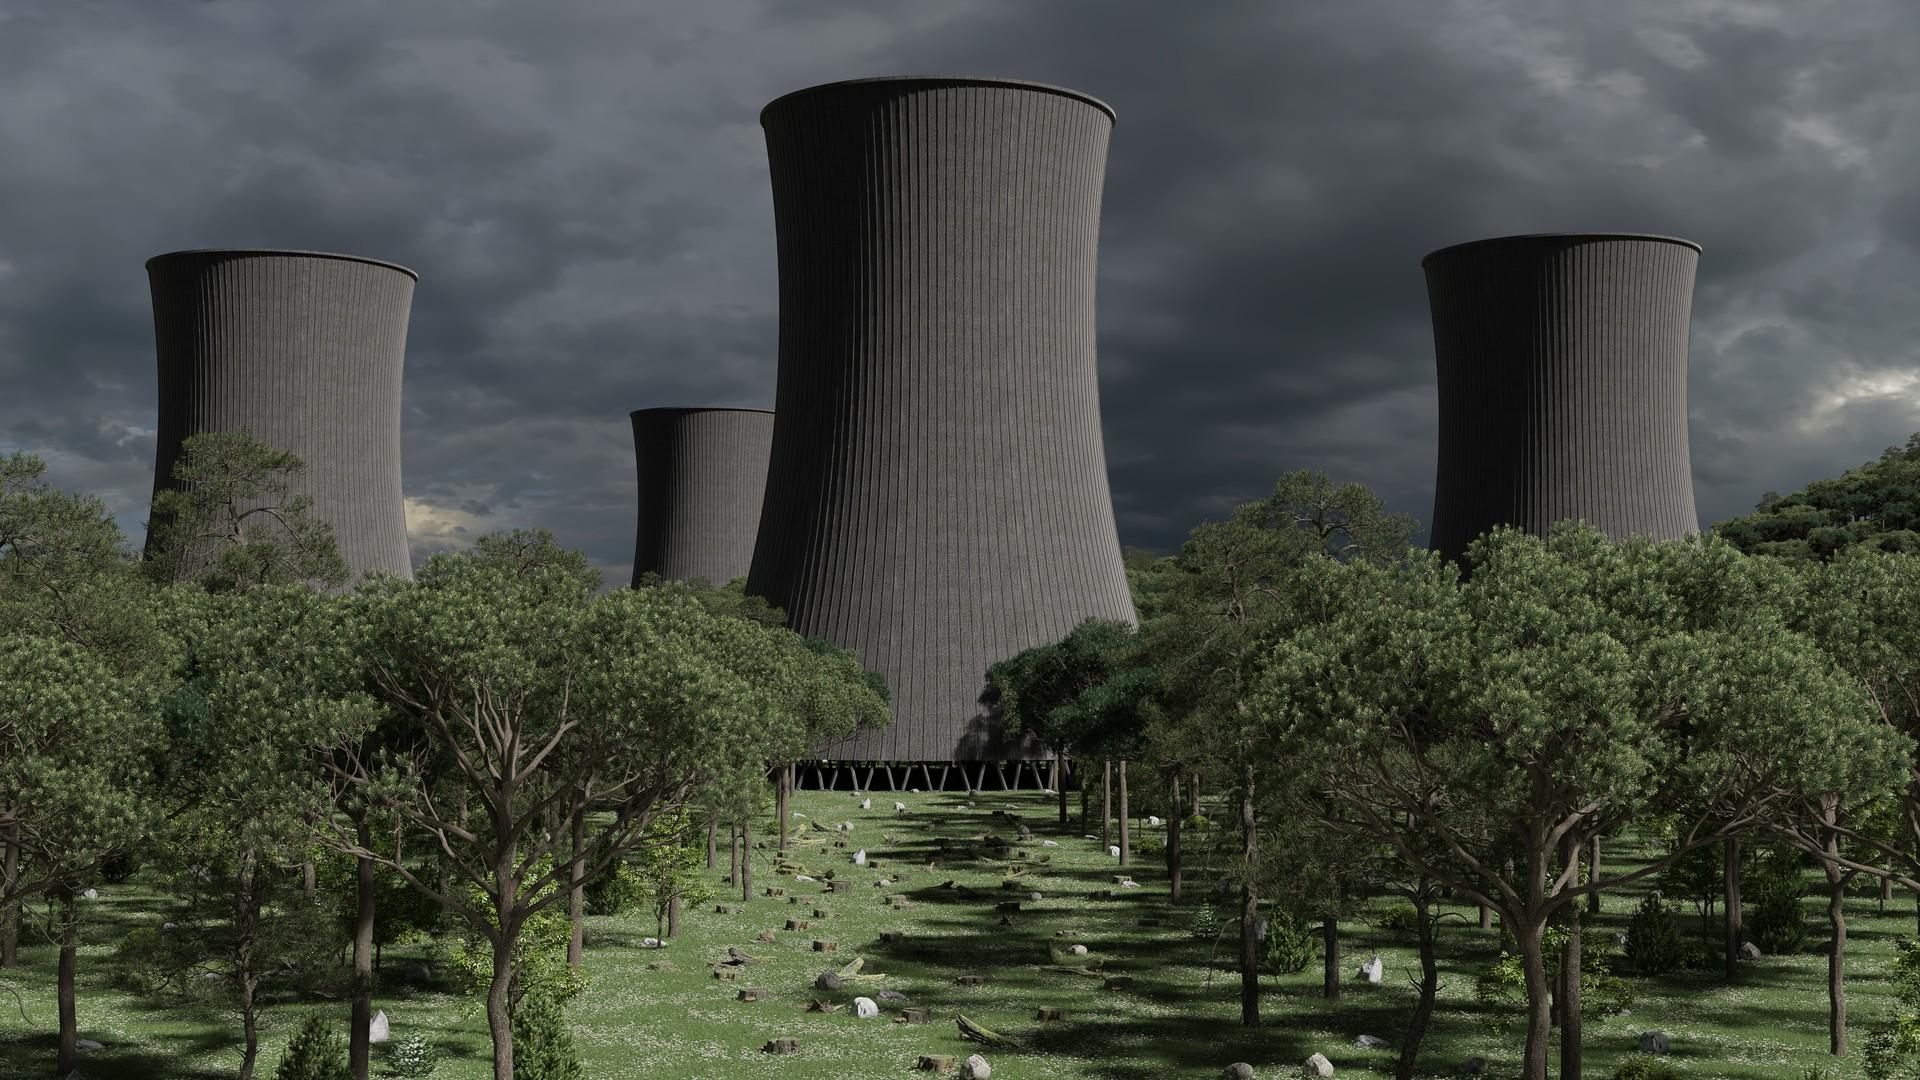 ArtStation Abandoned cooling towers Thijs van Velsen